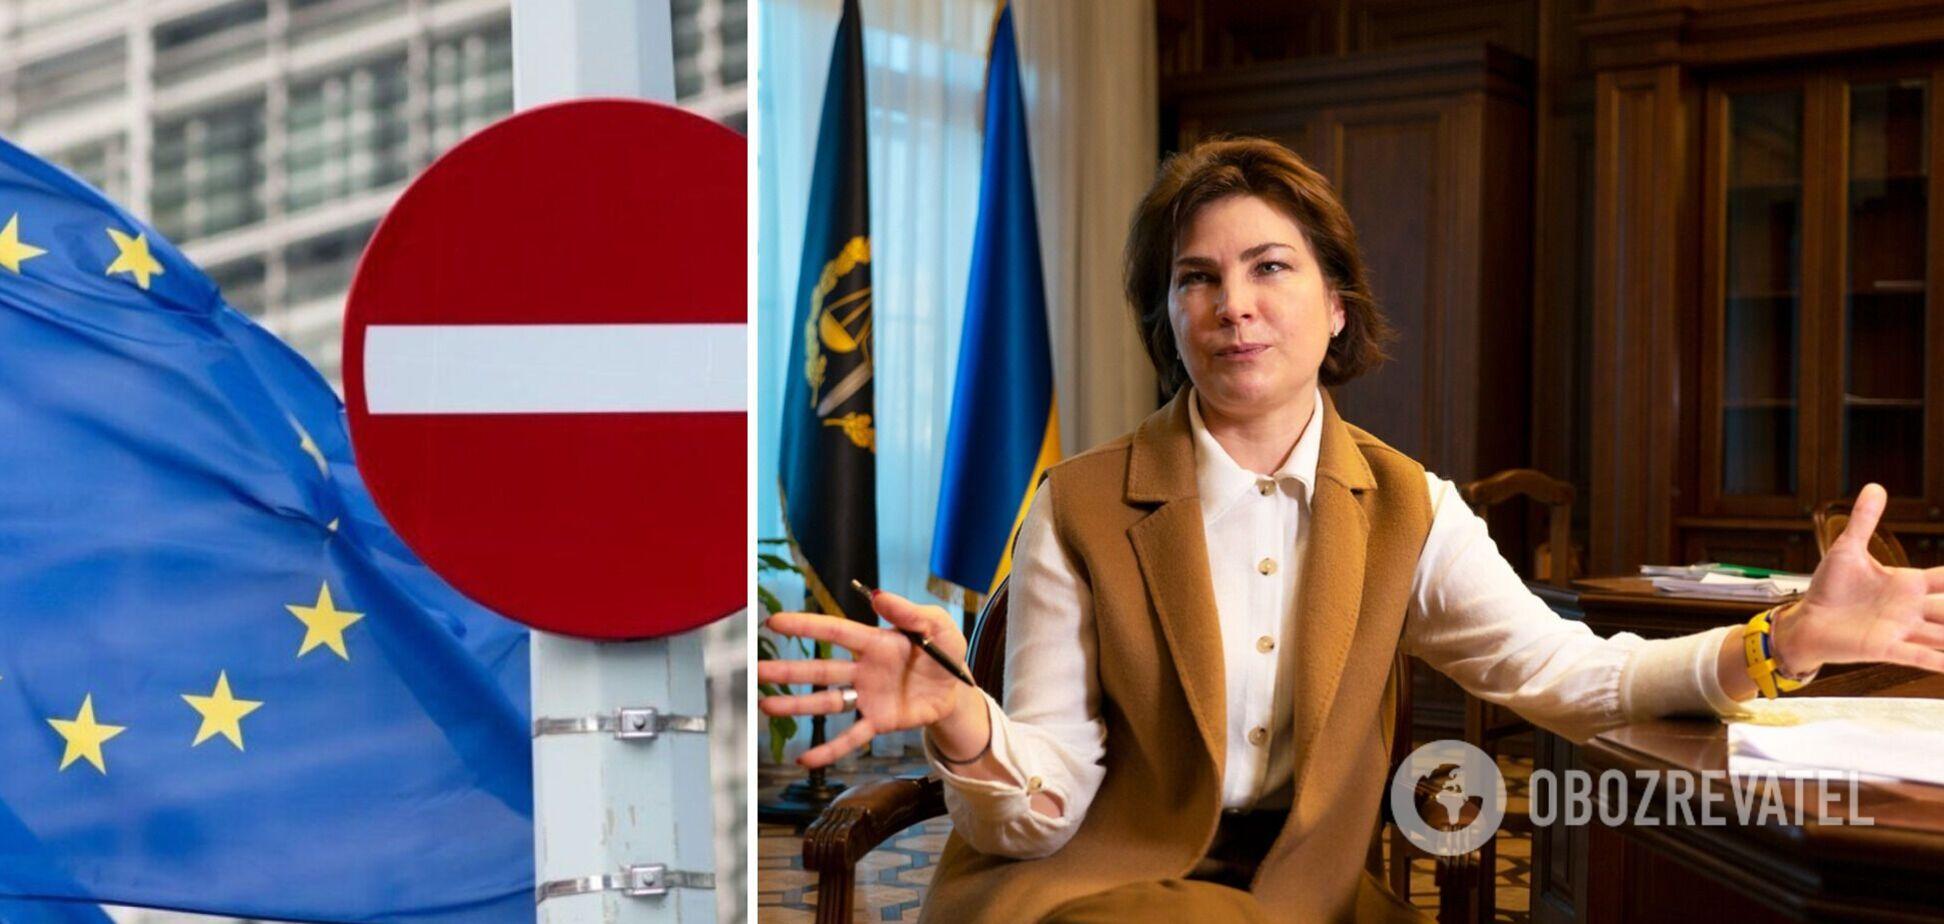 Венедиктова сказала, почему в ЕС снимают санкции с окружения Януковича